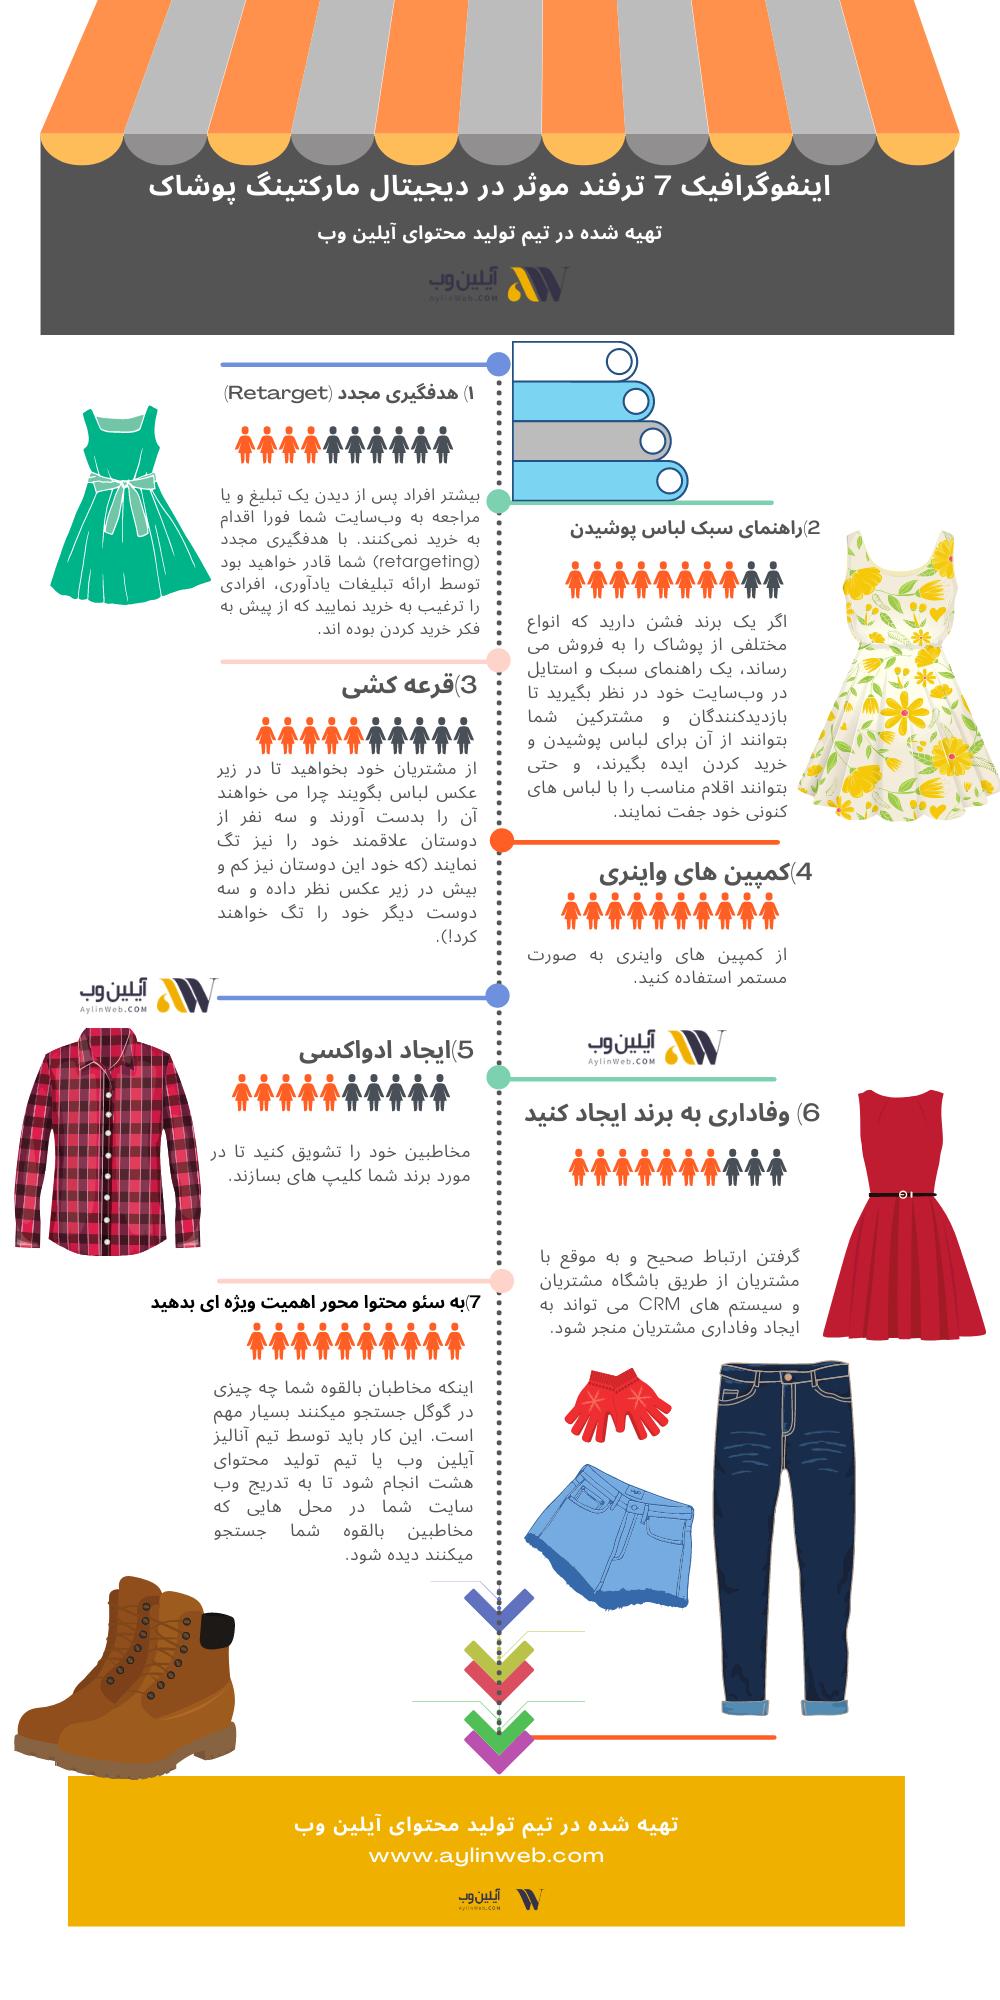 اینفوگرافیک 7 ترفند موثر در دیجیتال مارکتینگ پوشاک